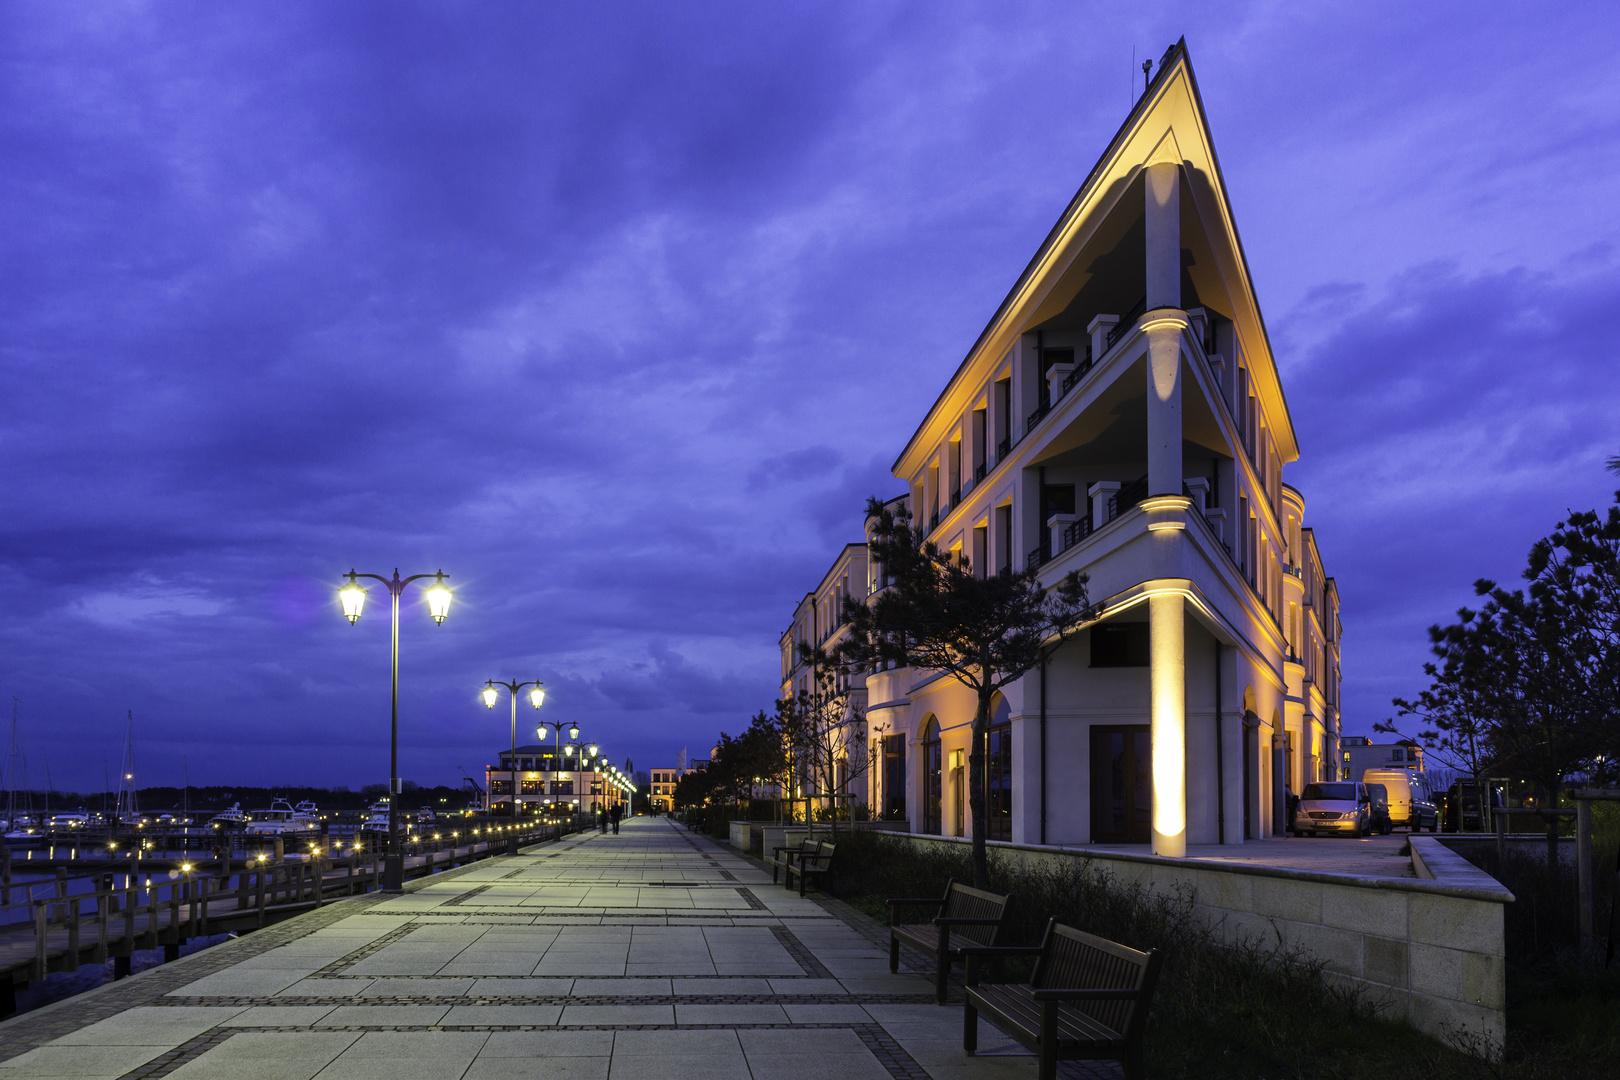 Abendpromenade